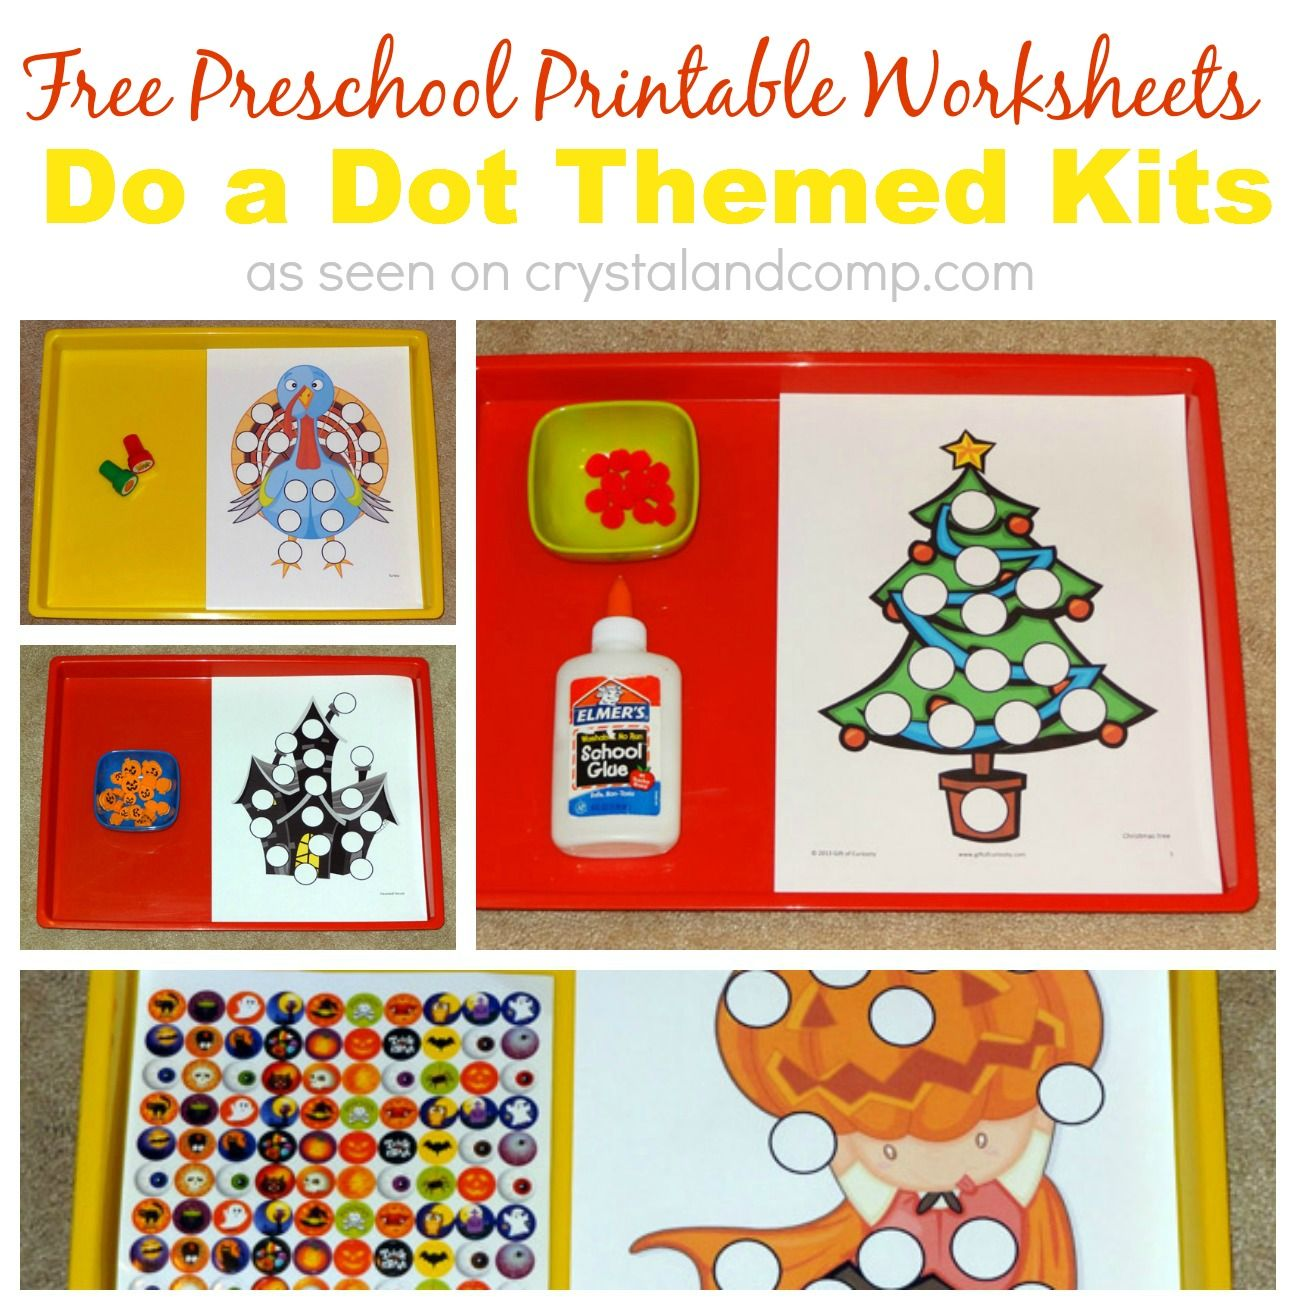 Free Preschool Printable Worksheets Do A Dot Themed Kits